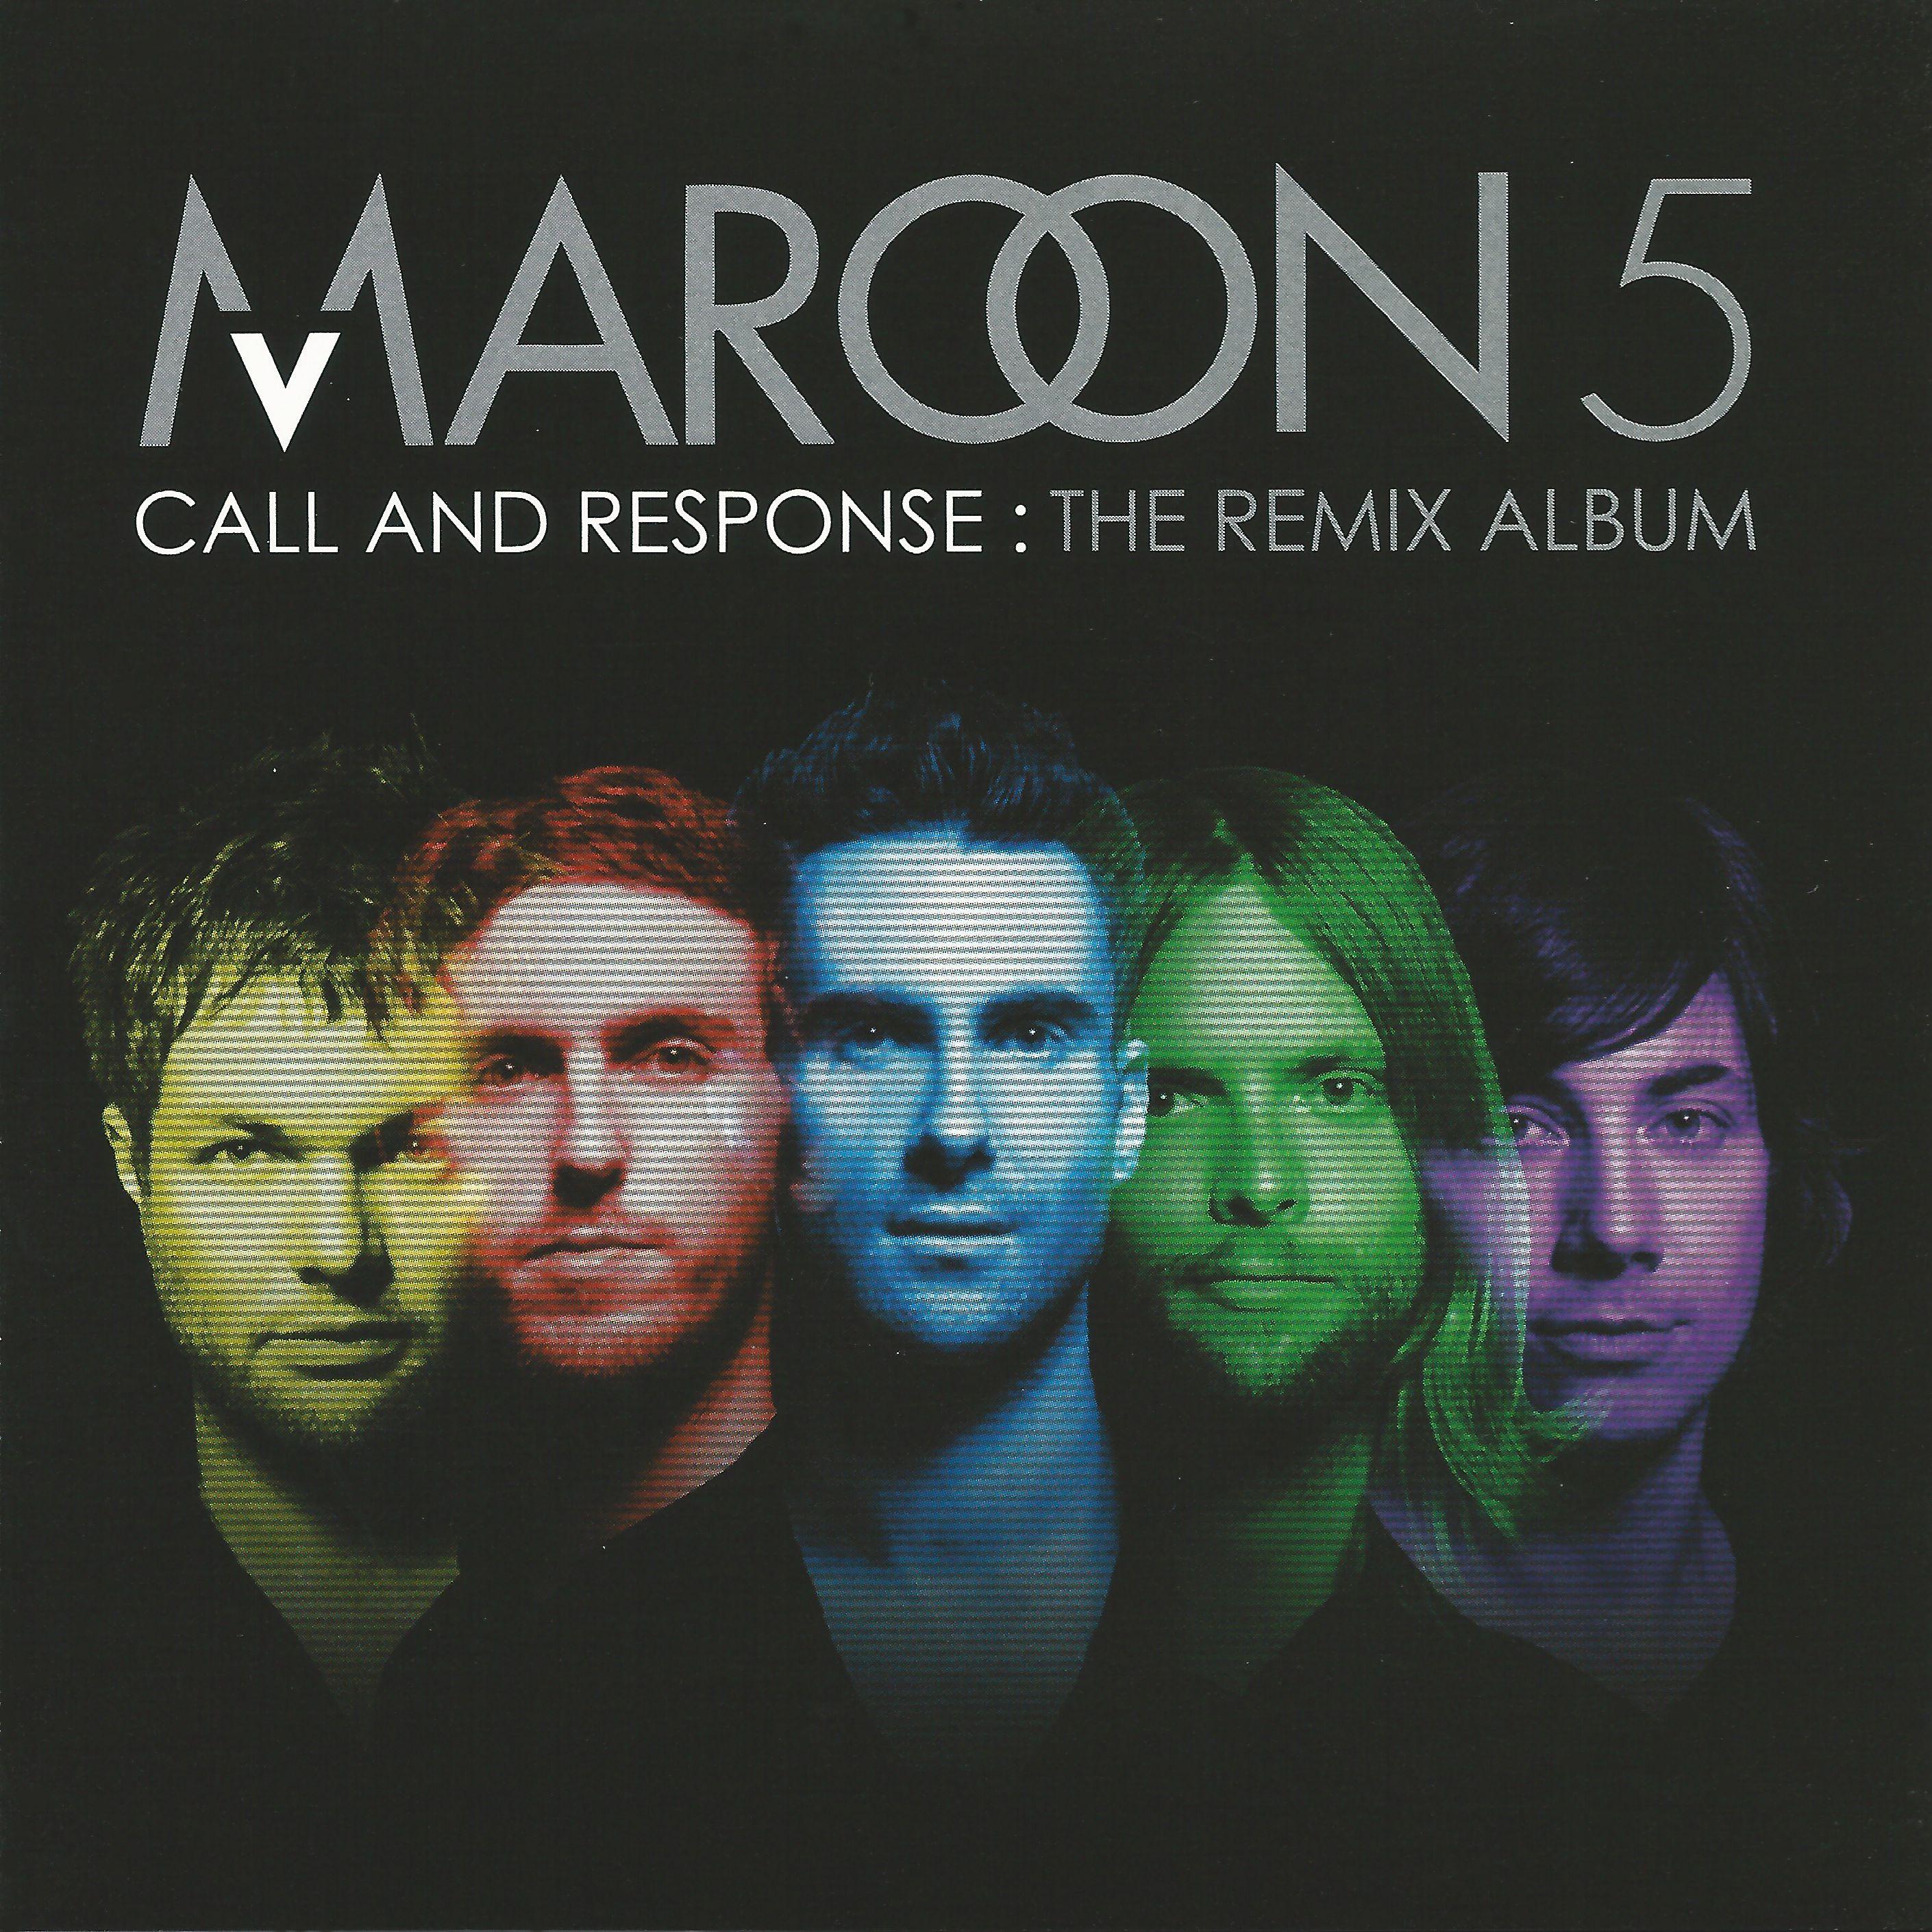 Maroon 5 - Call And Response: The Remix Album album cover